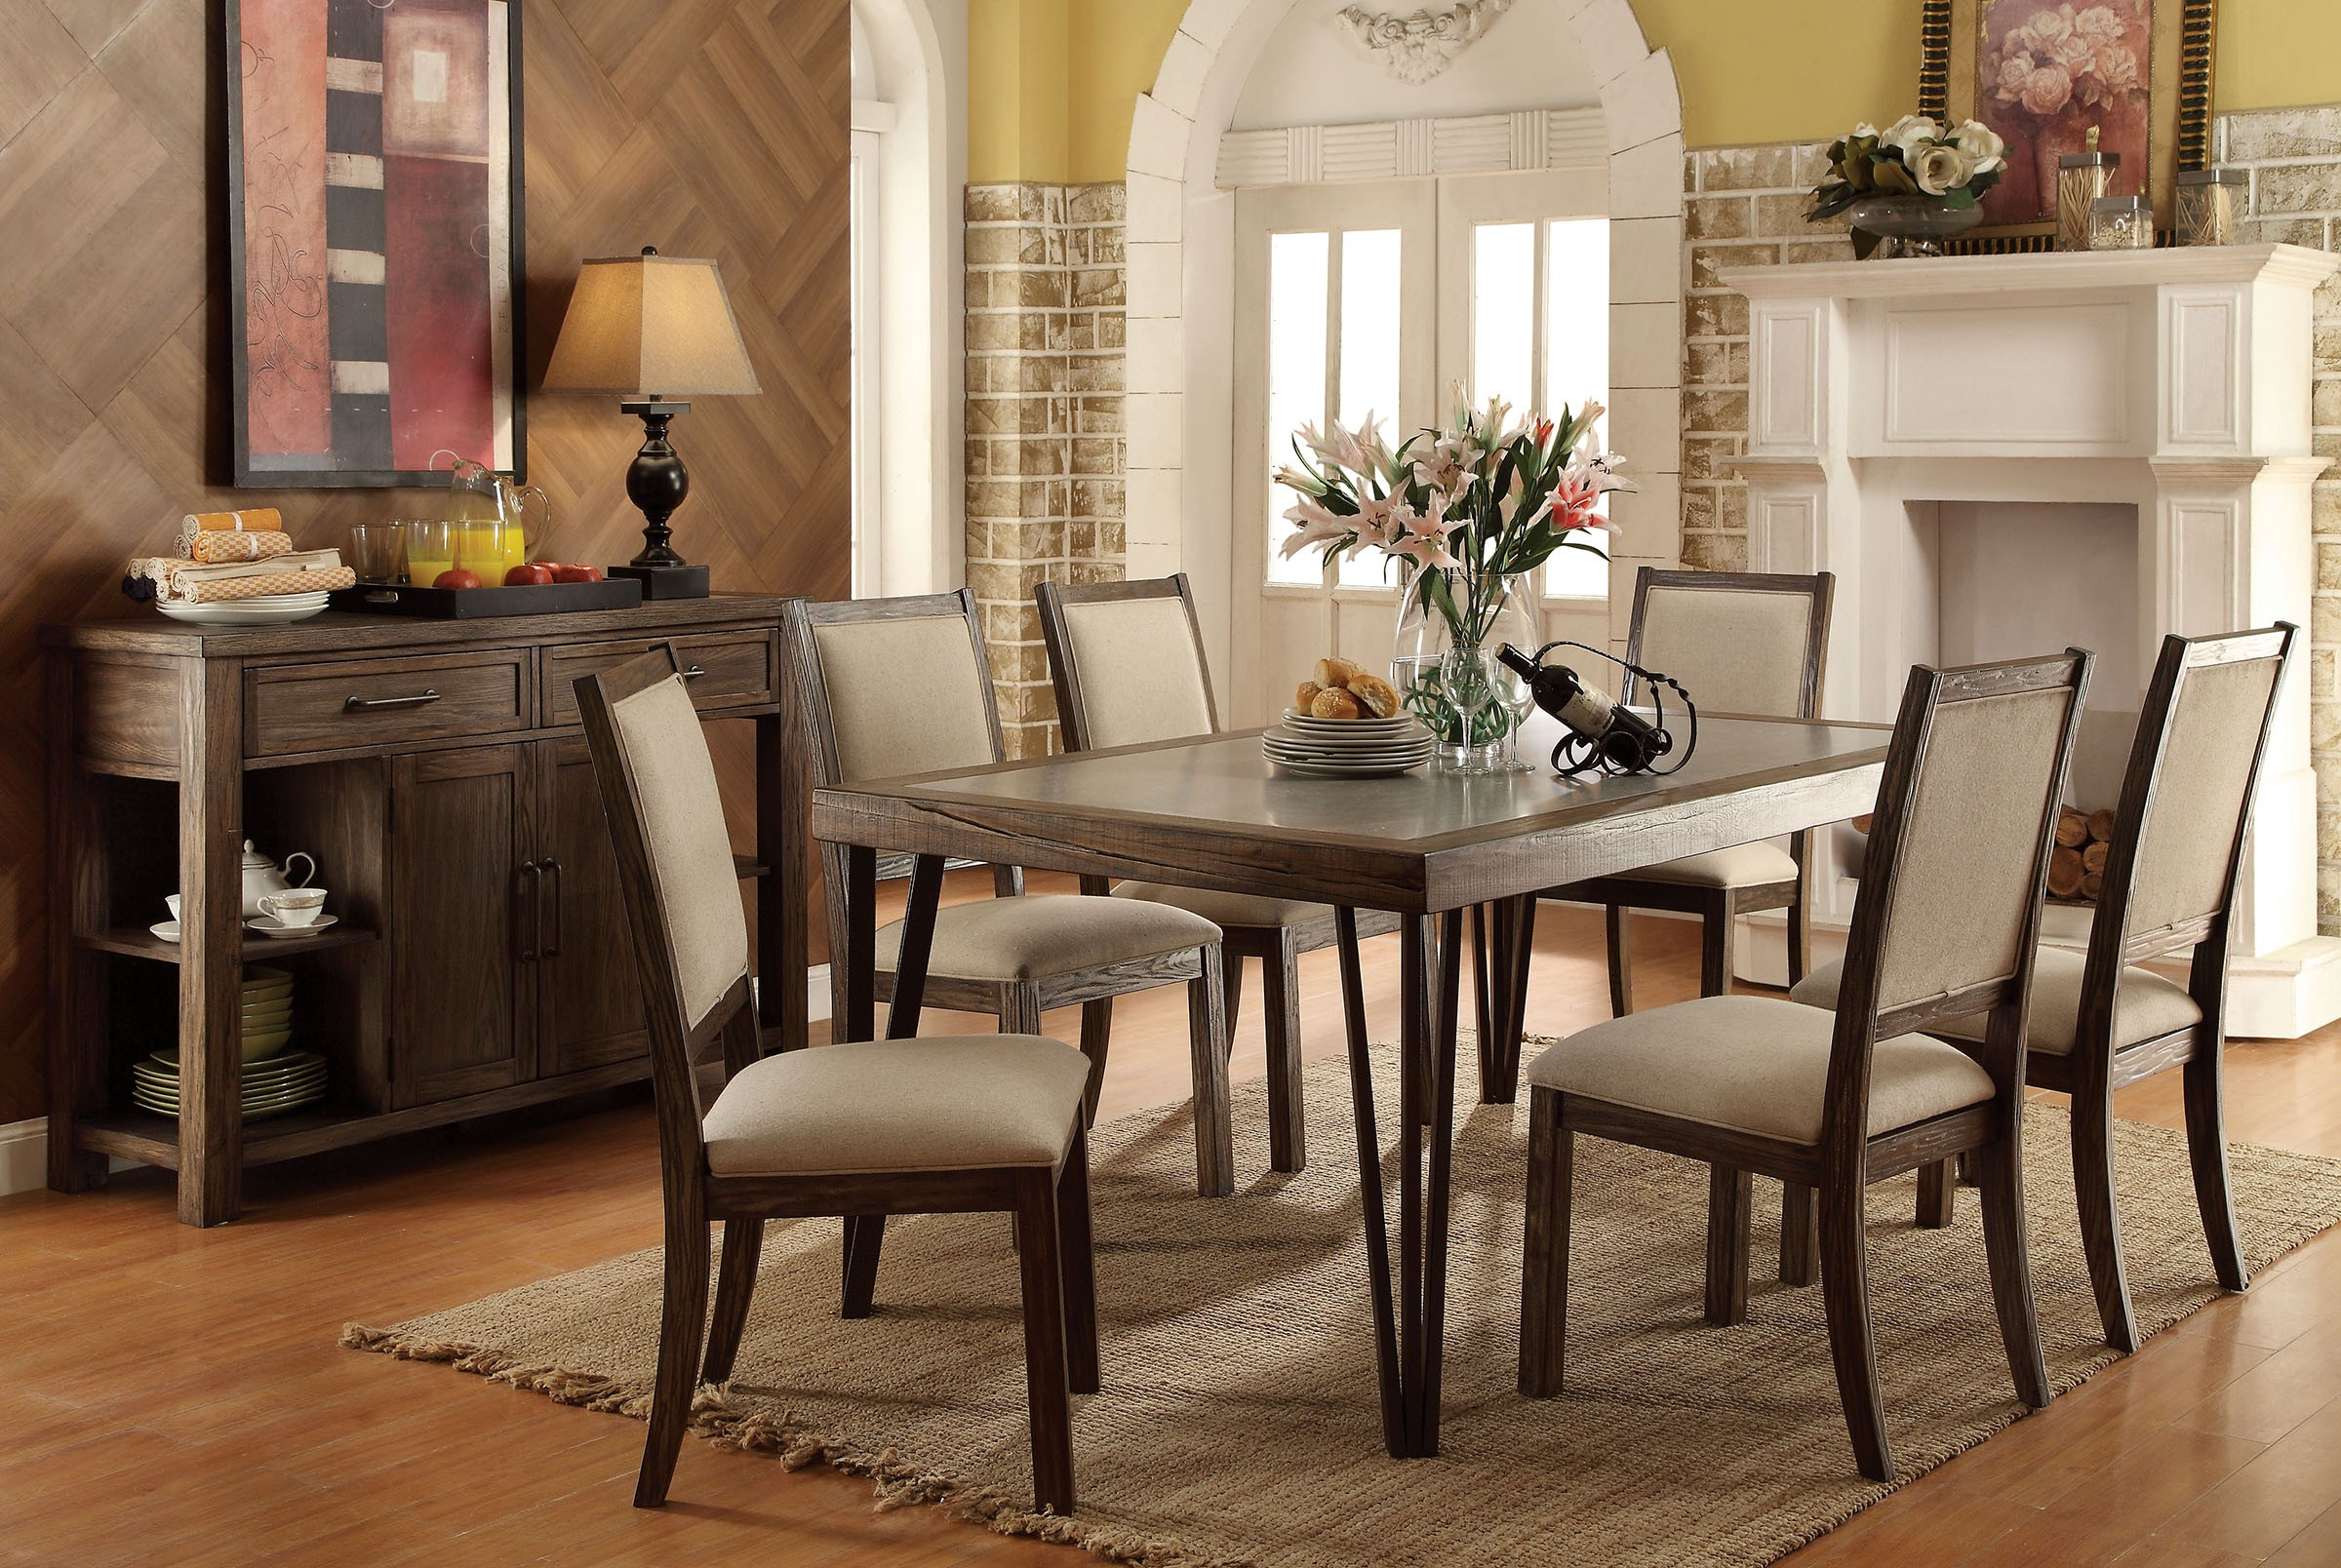 caithe rustic oak rectangular dining room set cm3563t furniture of america. Black Bedroom Furniture Sets. Home Design Ideas